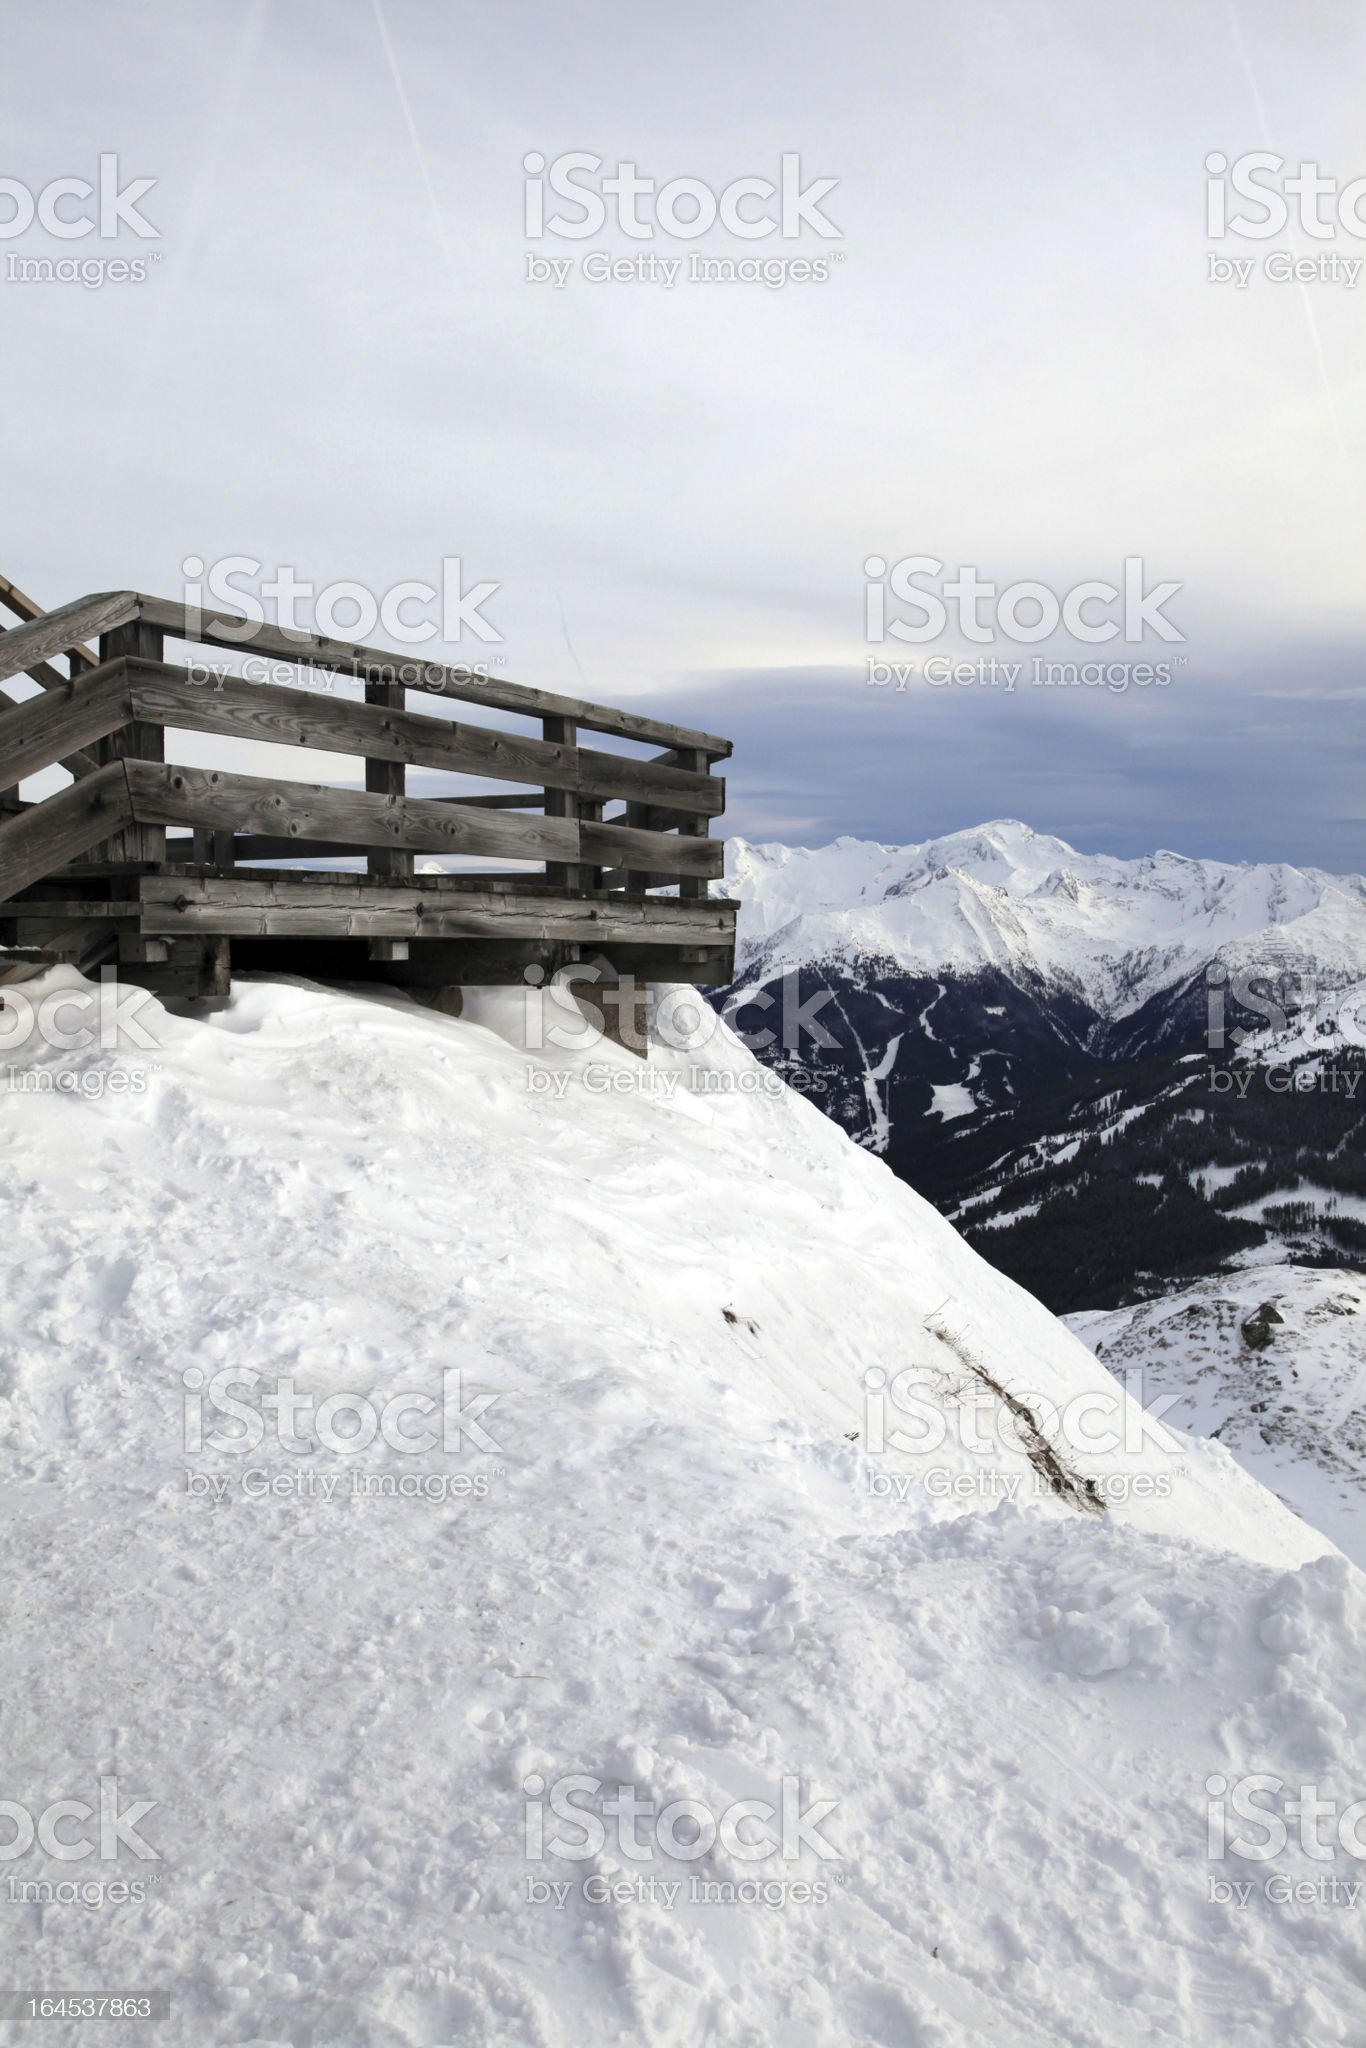 Wooden terrace at mountain ski resort in Alps, Austria royalty-free stock photo